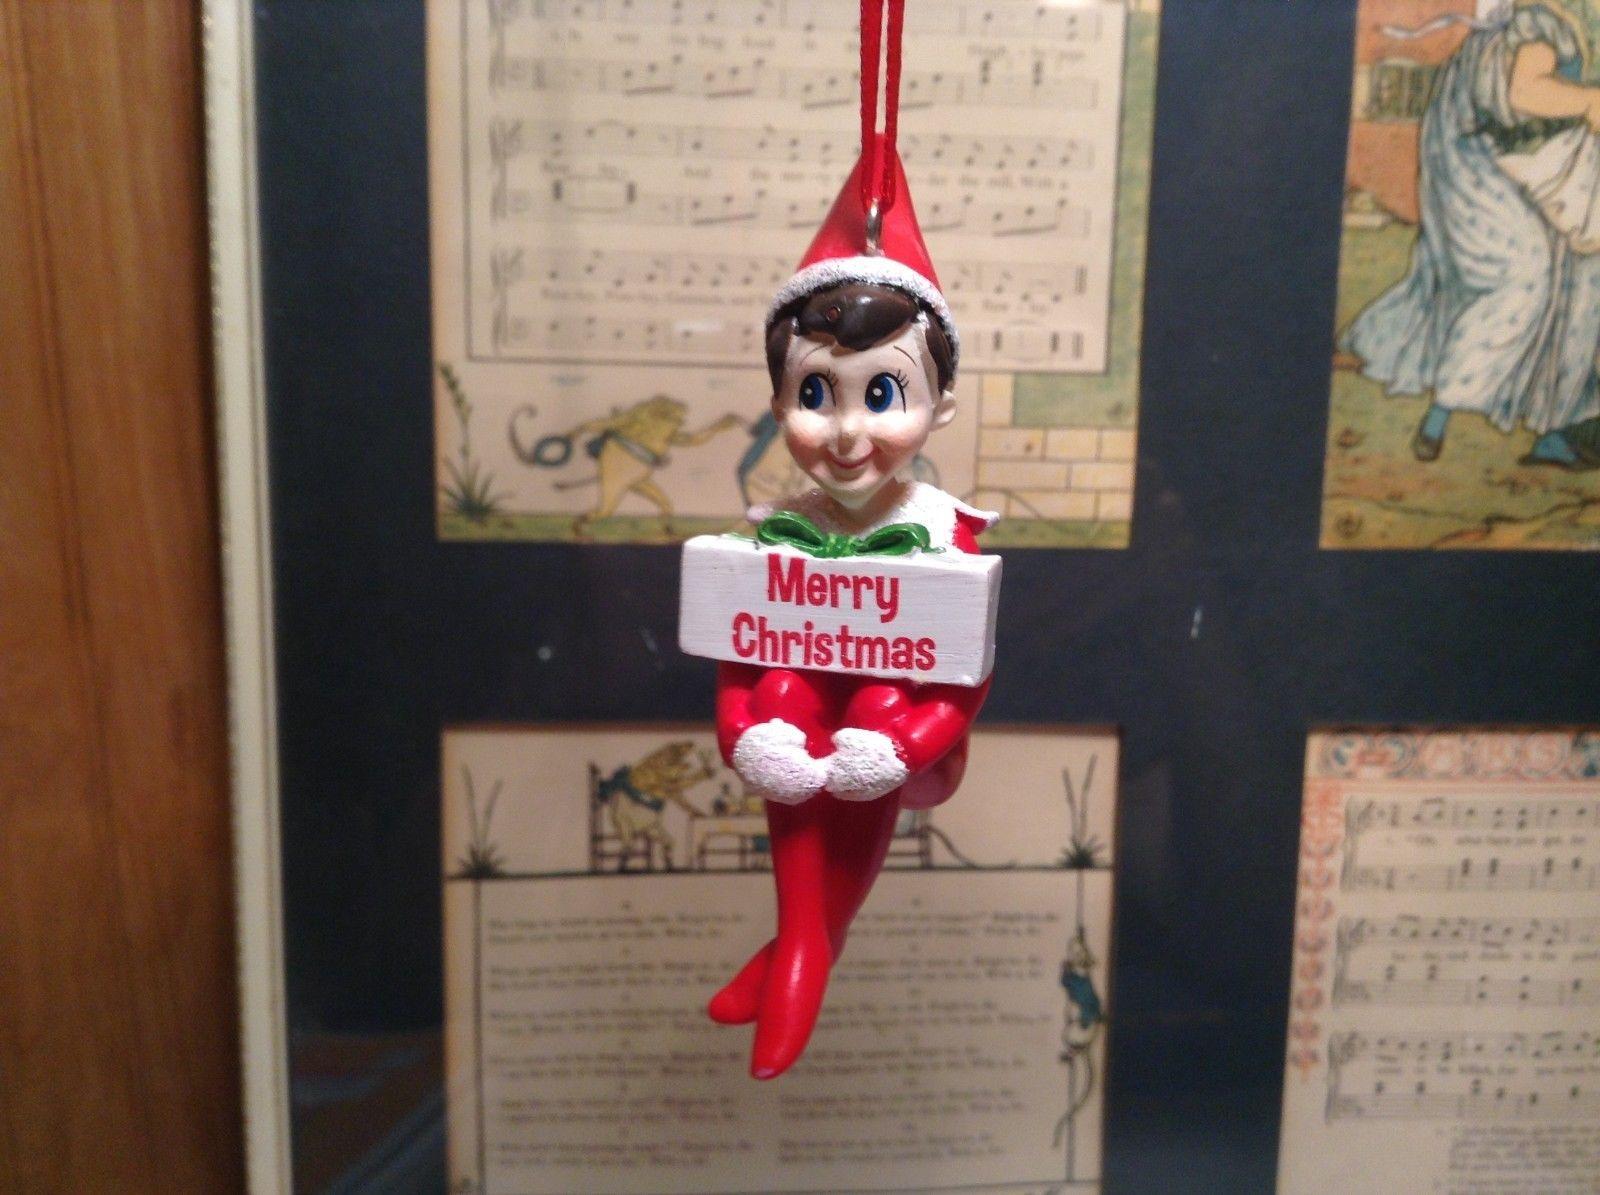 Dept 56 - Elf on the Shelf - Merry Christmas banner Christmas Ornament